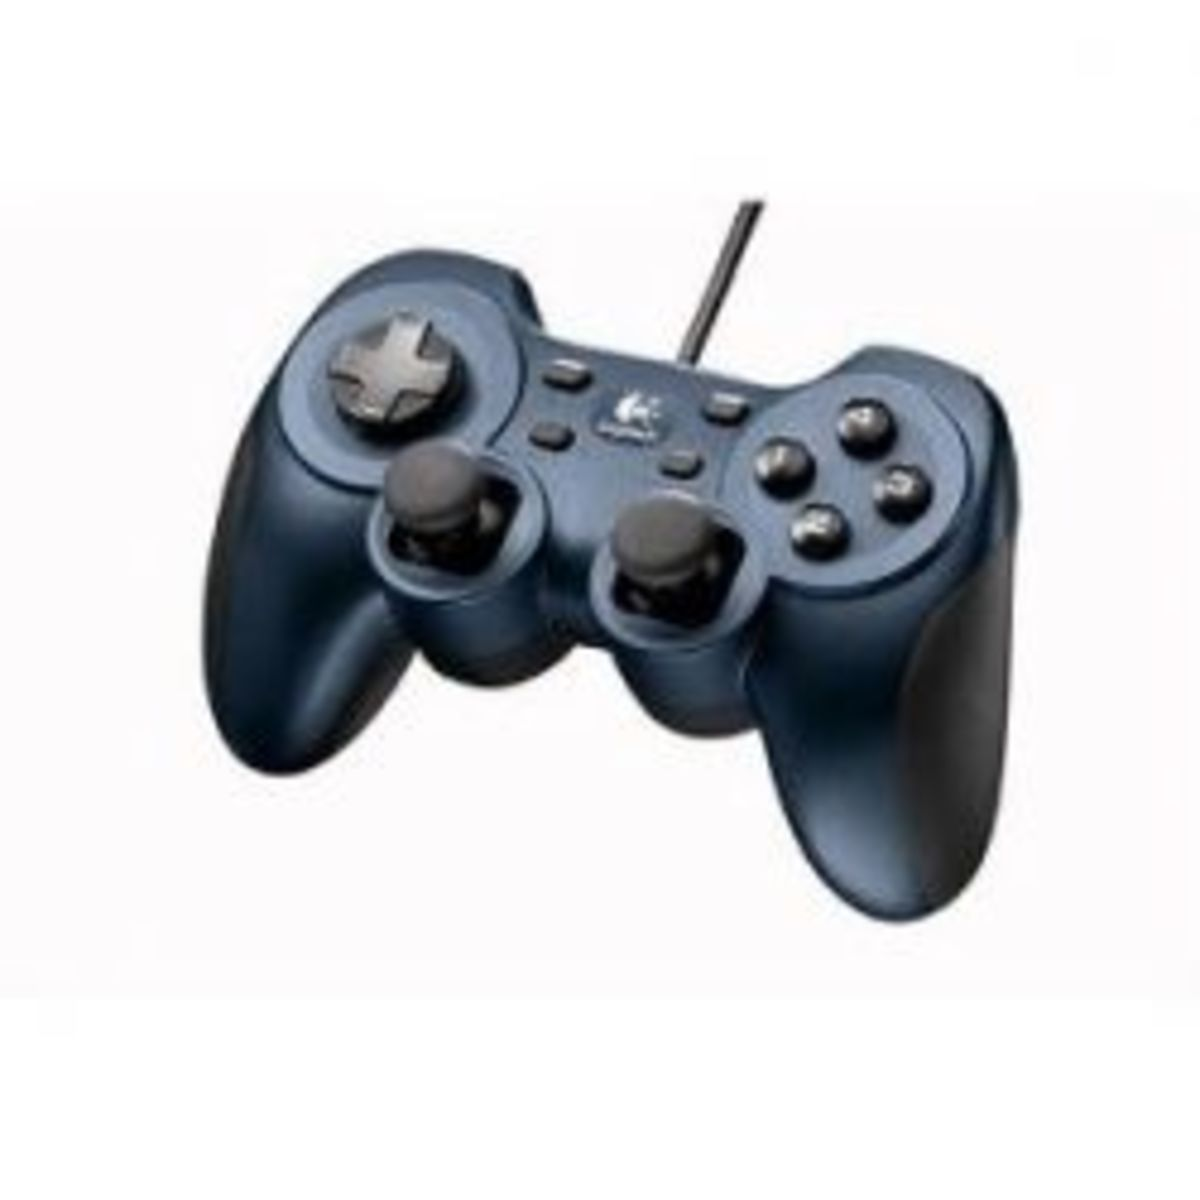 Logitech Rumblepad 2 Vibration Feedback Gamepad